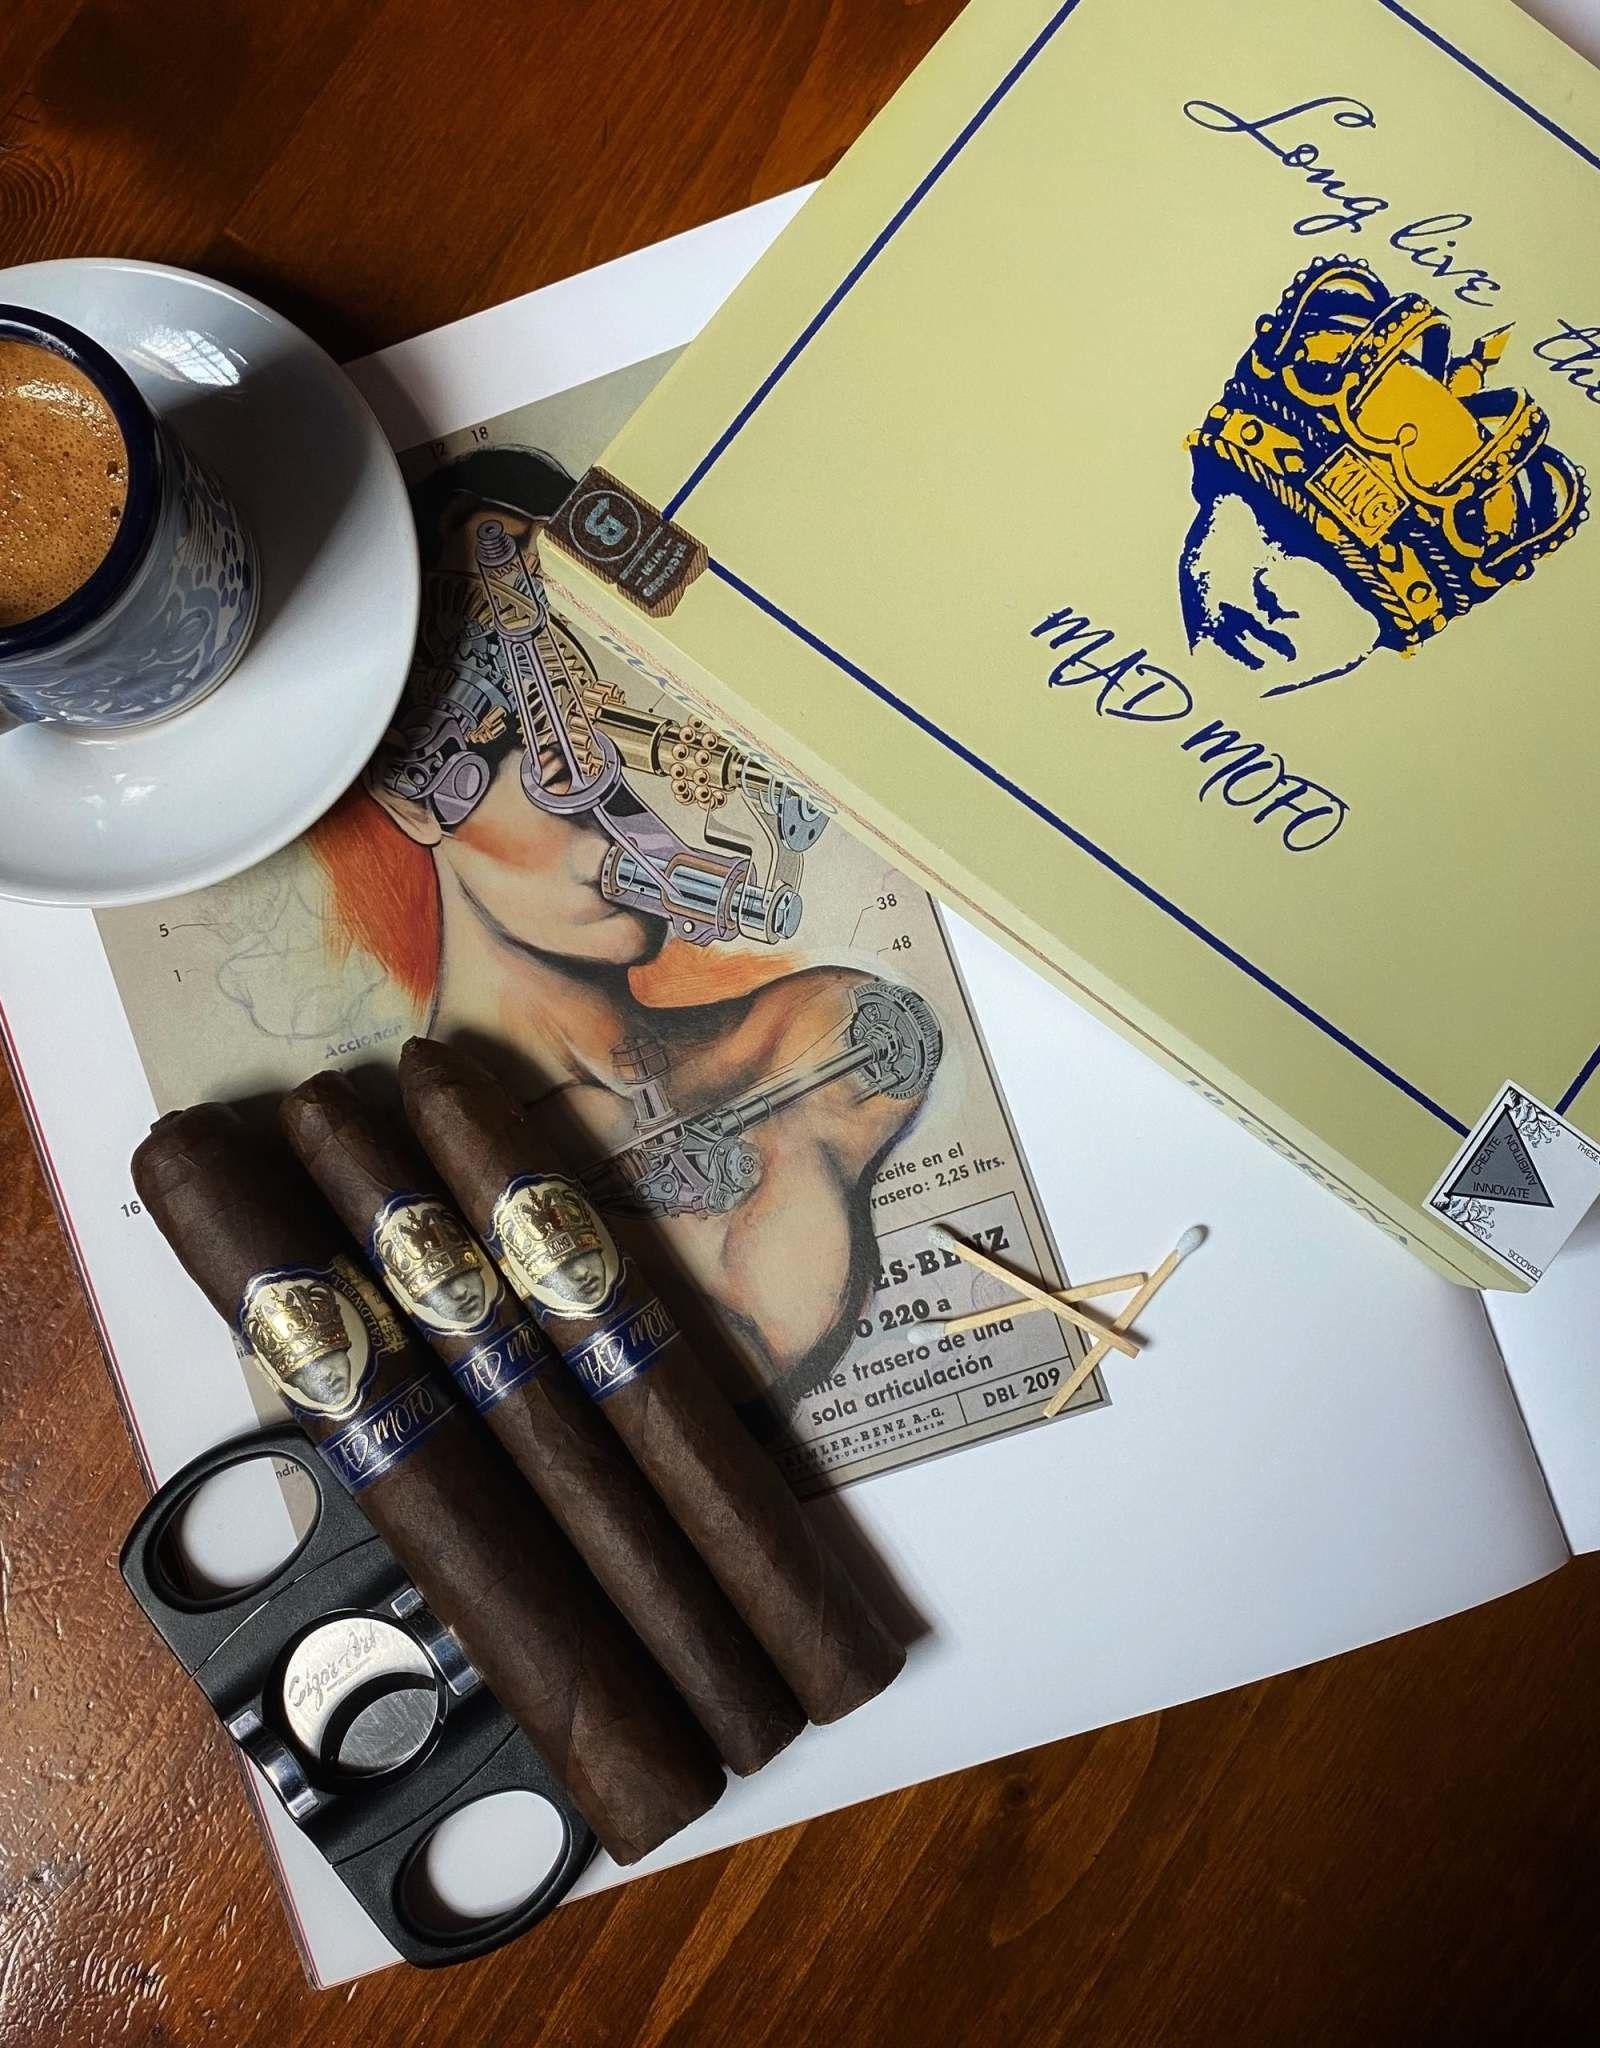 Caldwell Cigar Co Caldwell Long Live The King Mad Mofo Magnum 6 x 60